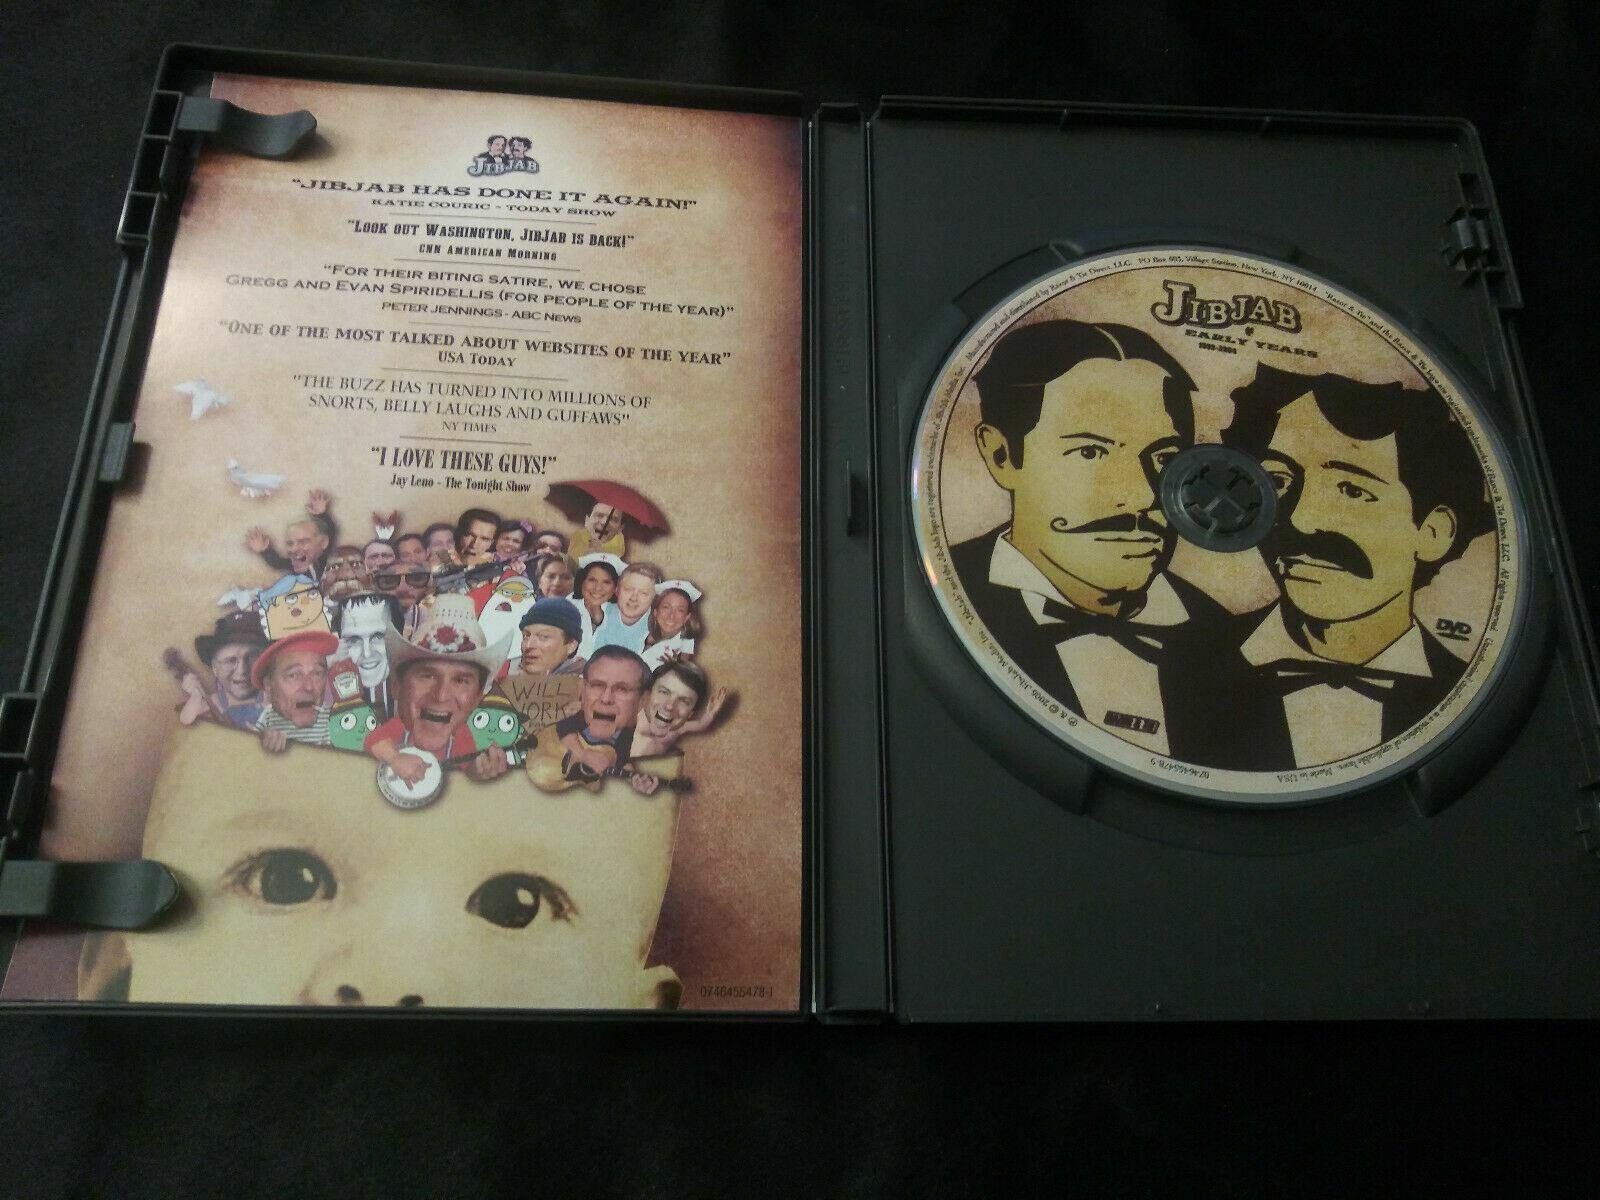 Jib Jab The Early Years DVD 1999-2004 Political Christmas George Bush Rare  - $10.00